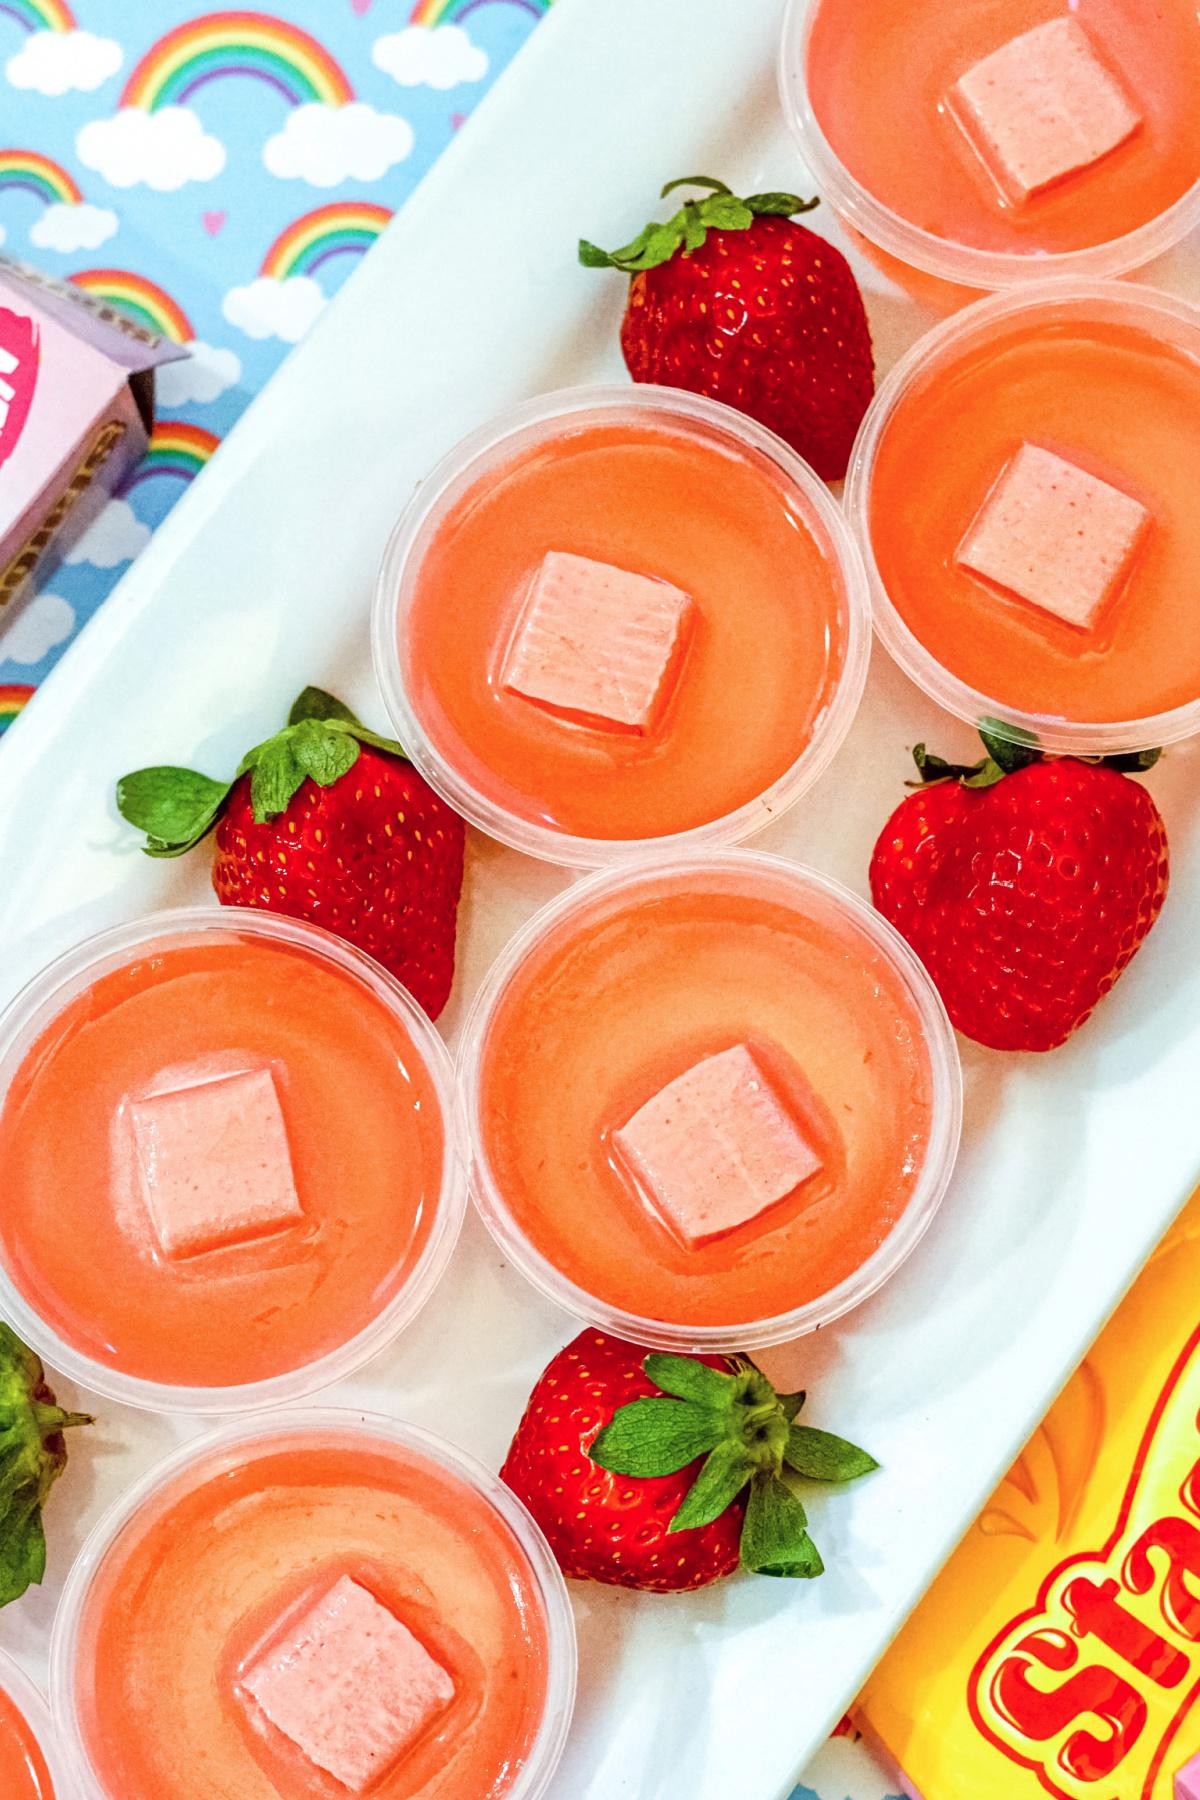 Pink Starburst Jello shots recipe